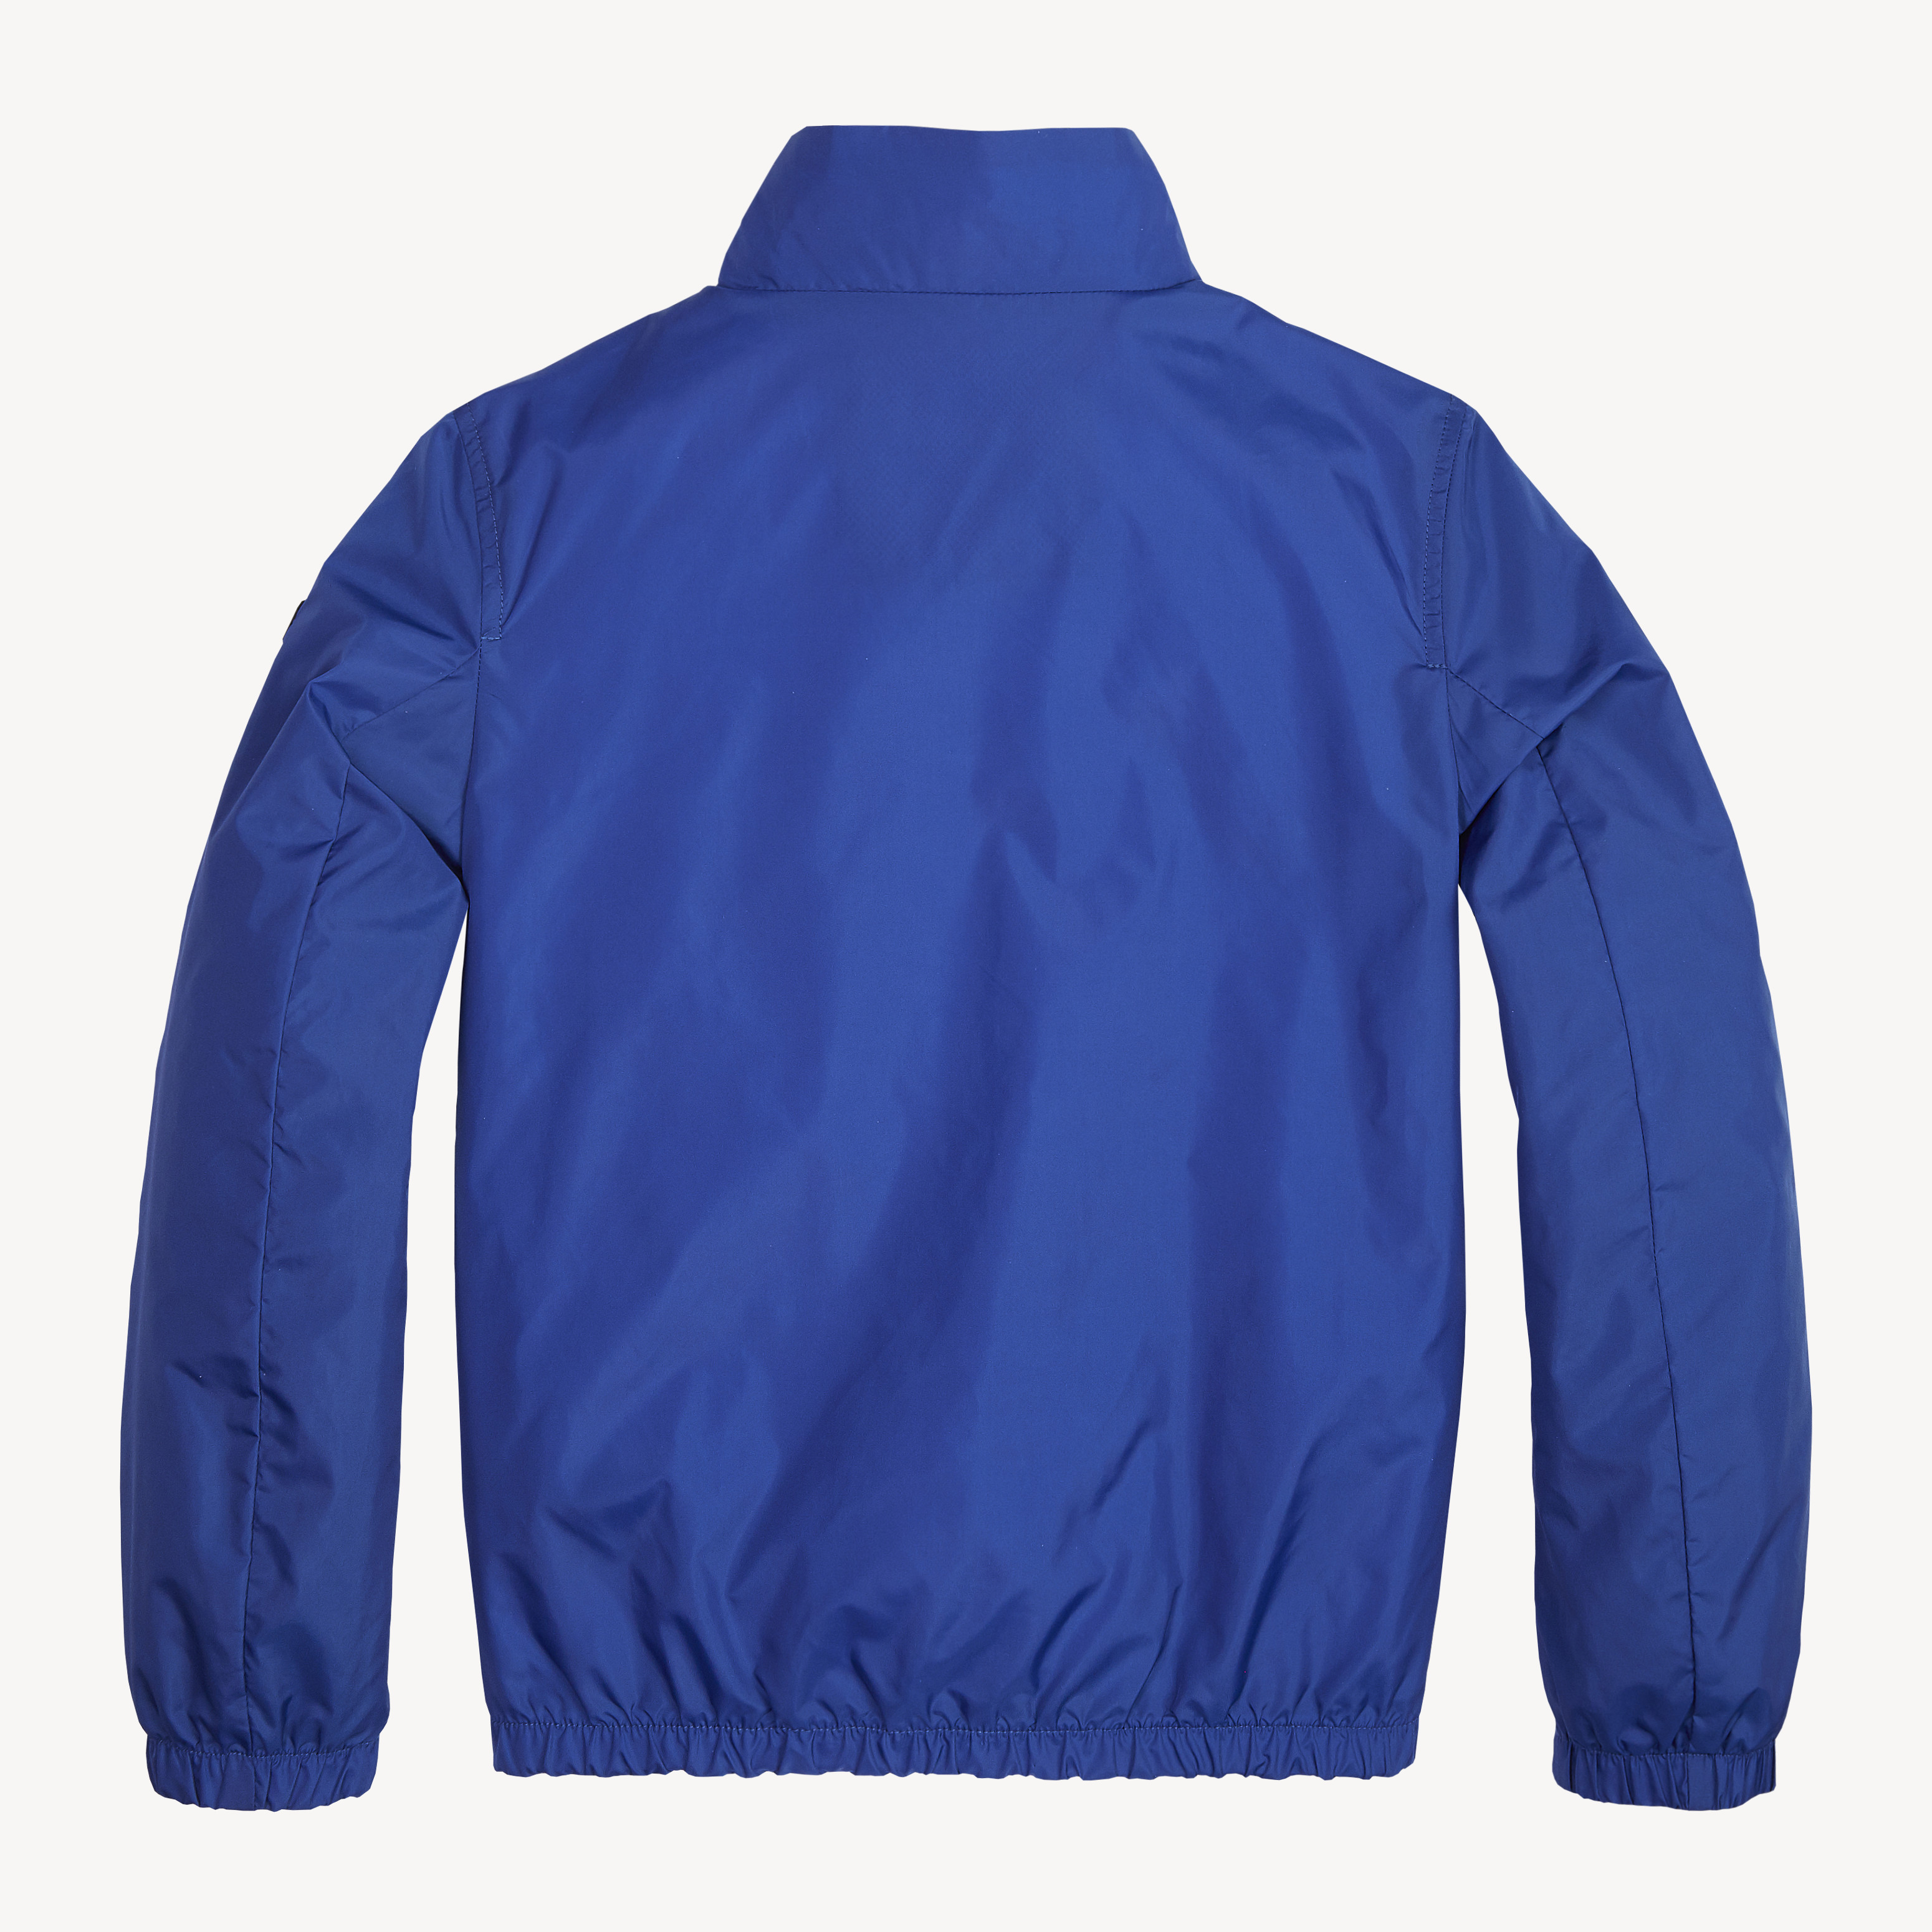 dc3868e0114 Μπουφάν αντιανεμικό μπλε ρουά (ESSENTIAL TOMMY JACKET) – Meli Melo eShop